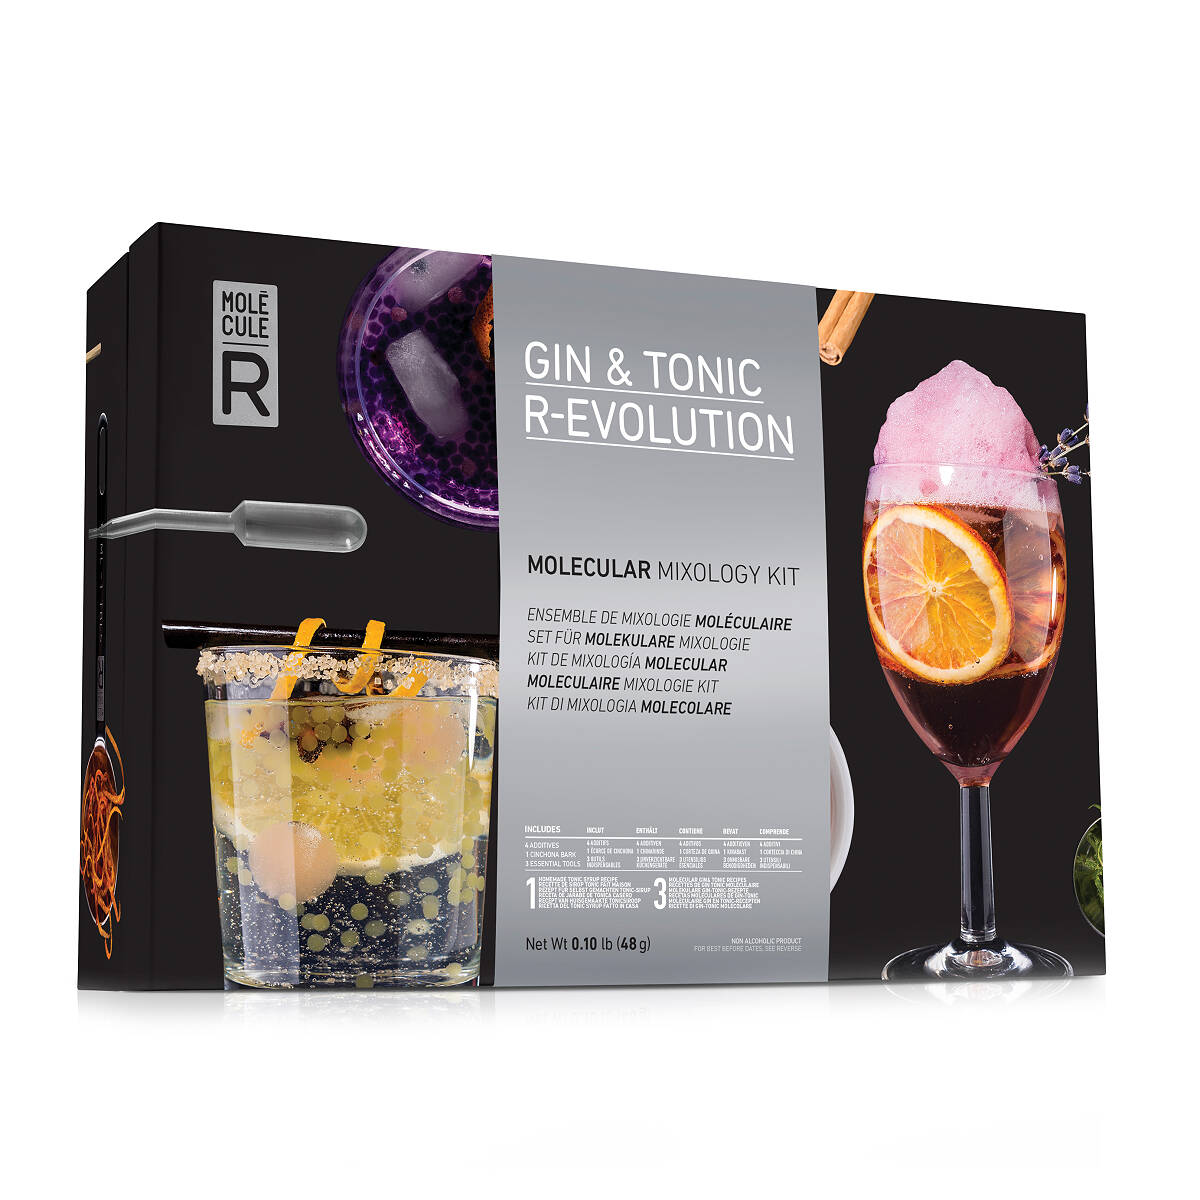 Molecular mixology kit gin tonic craft cocktail set molecular mixology kit gin tonic 2 thumbnail solutioingenieria Gallery